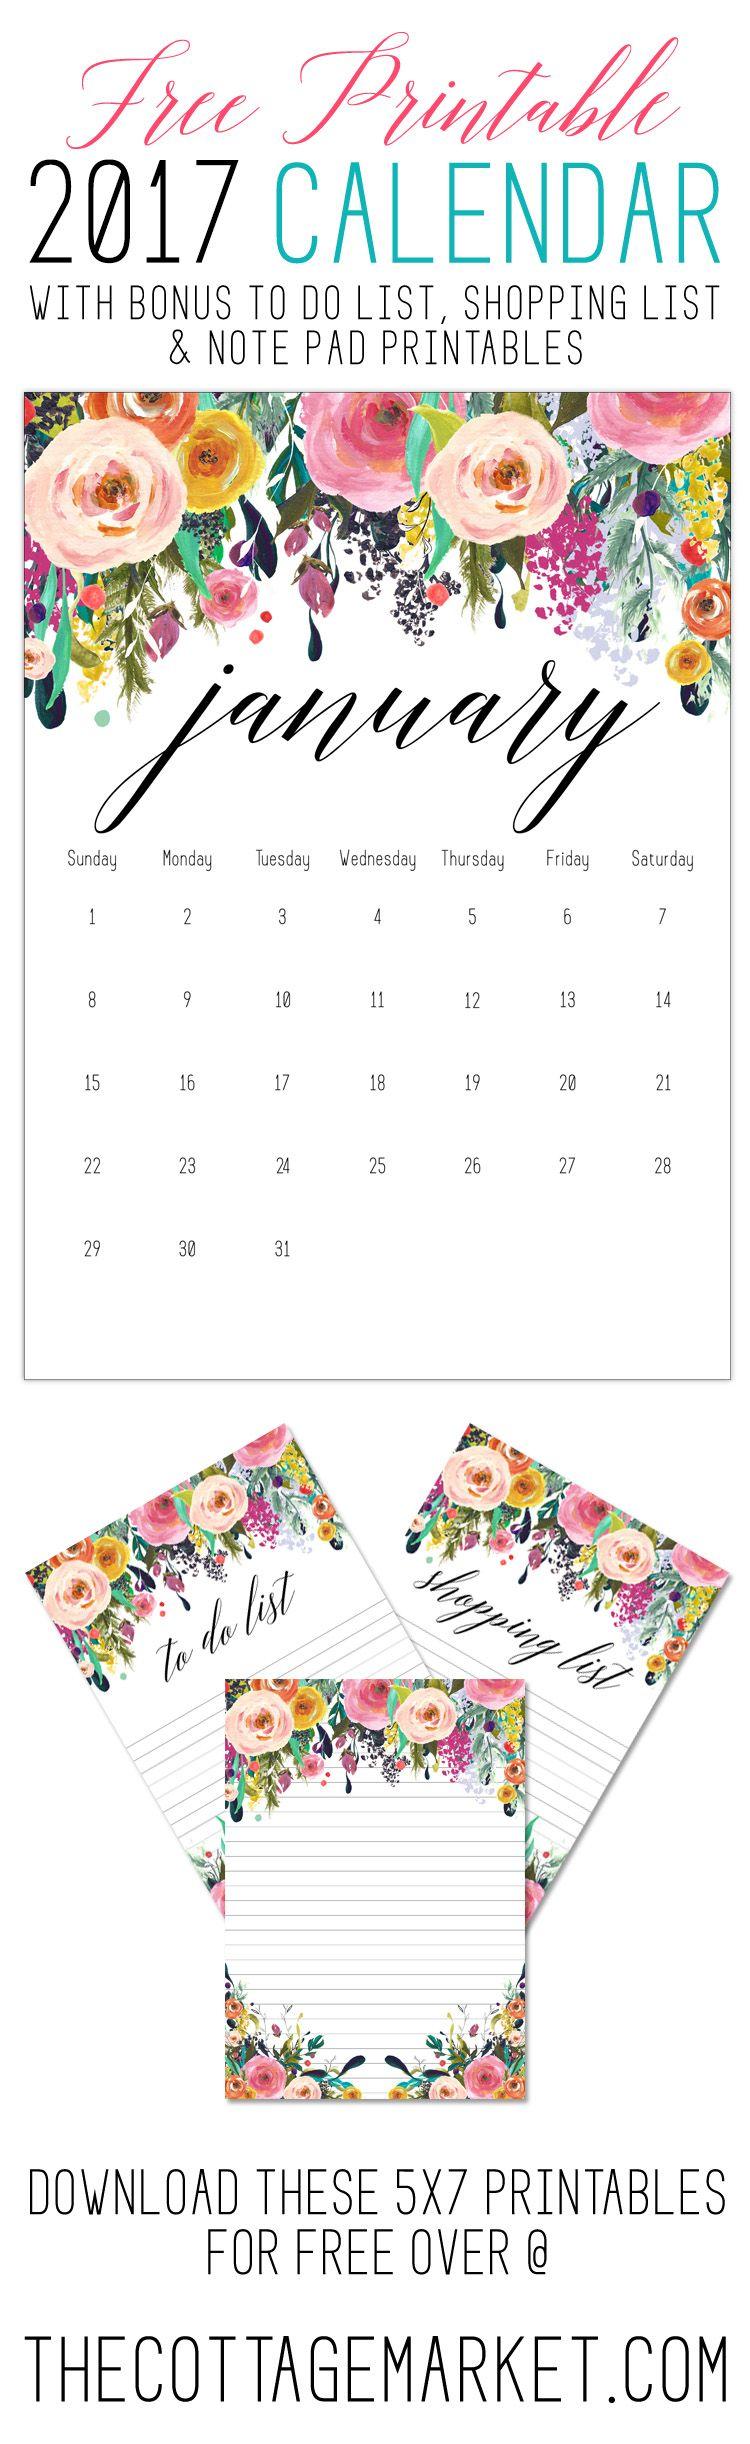 50+ 2017 FREE printable calendars   Printable calendars, Free ...